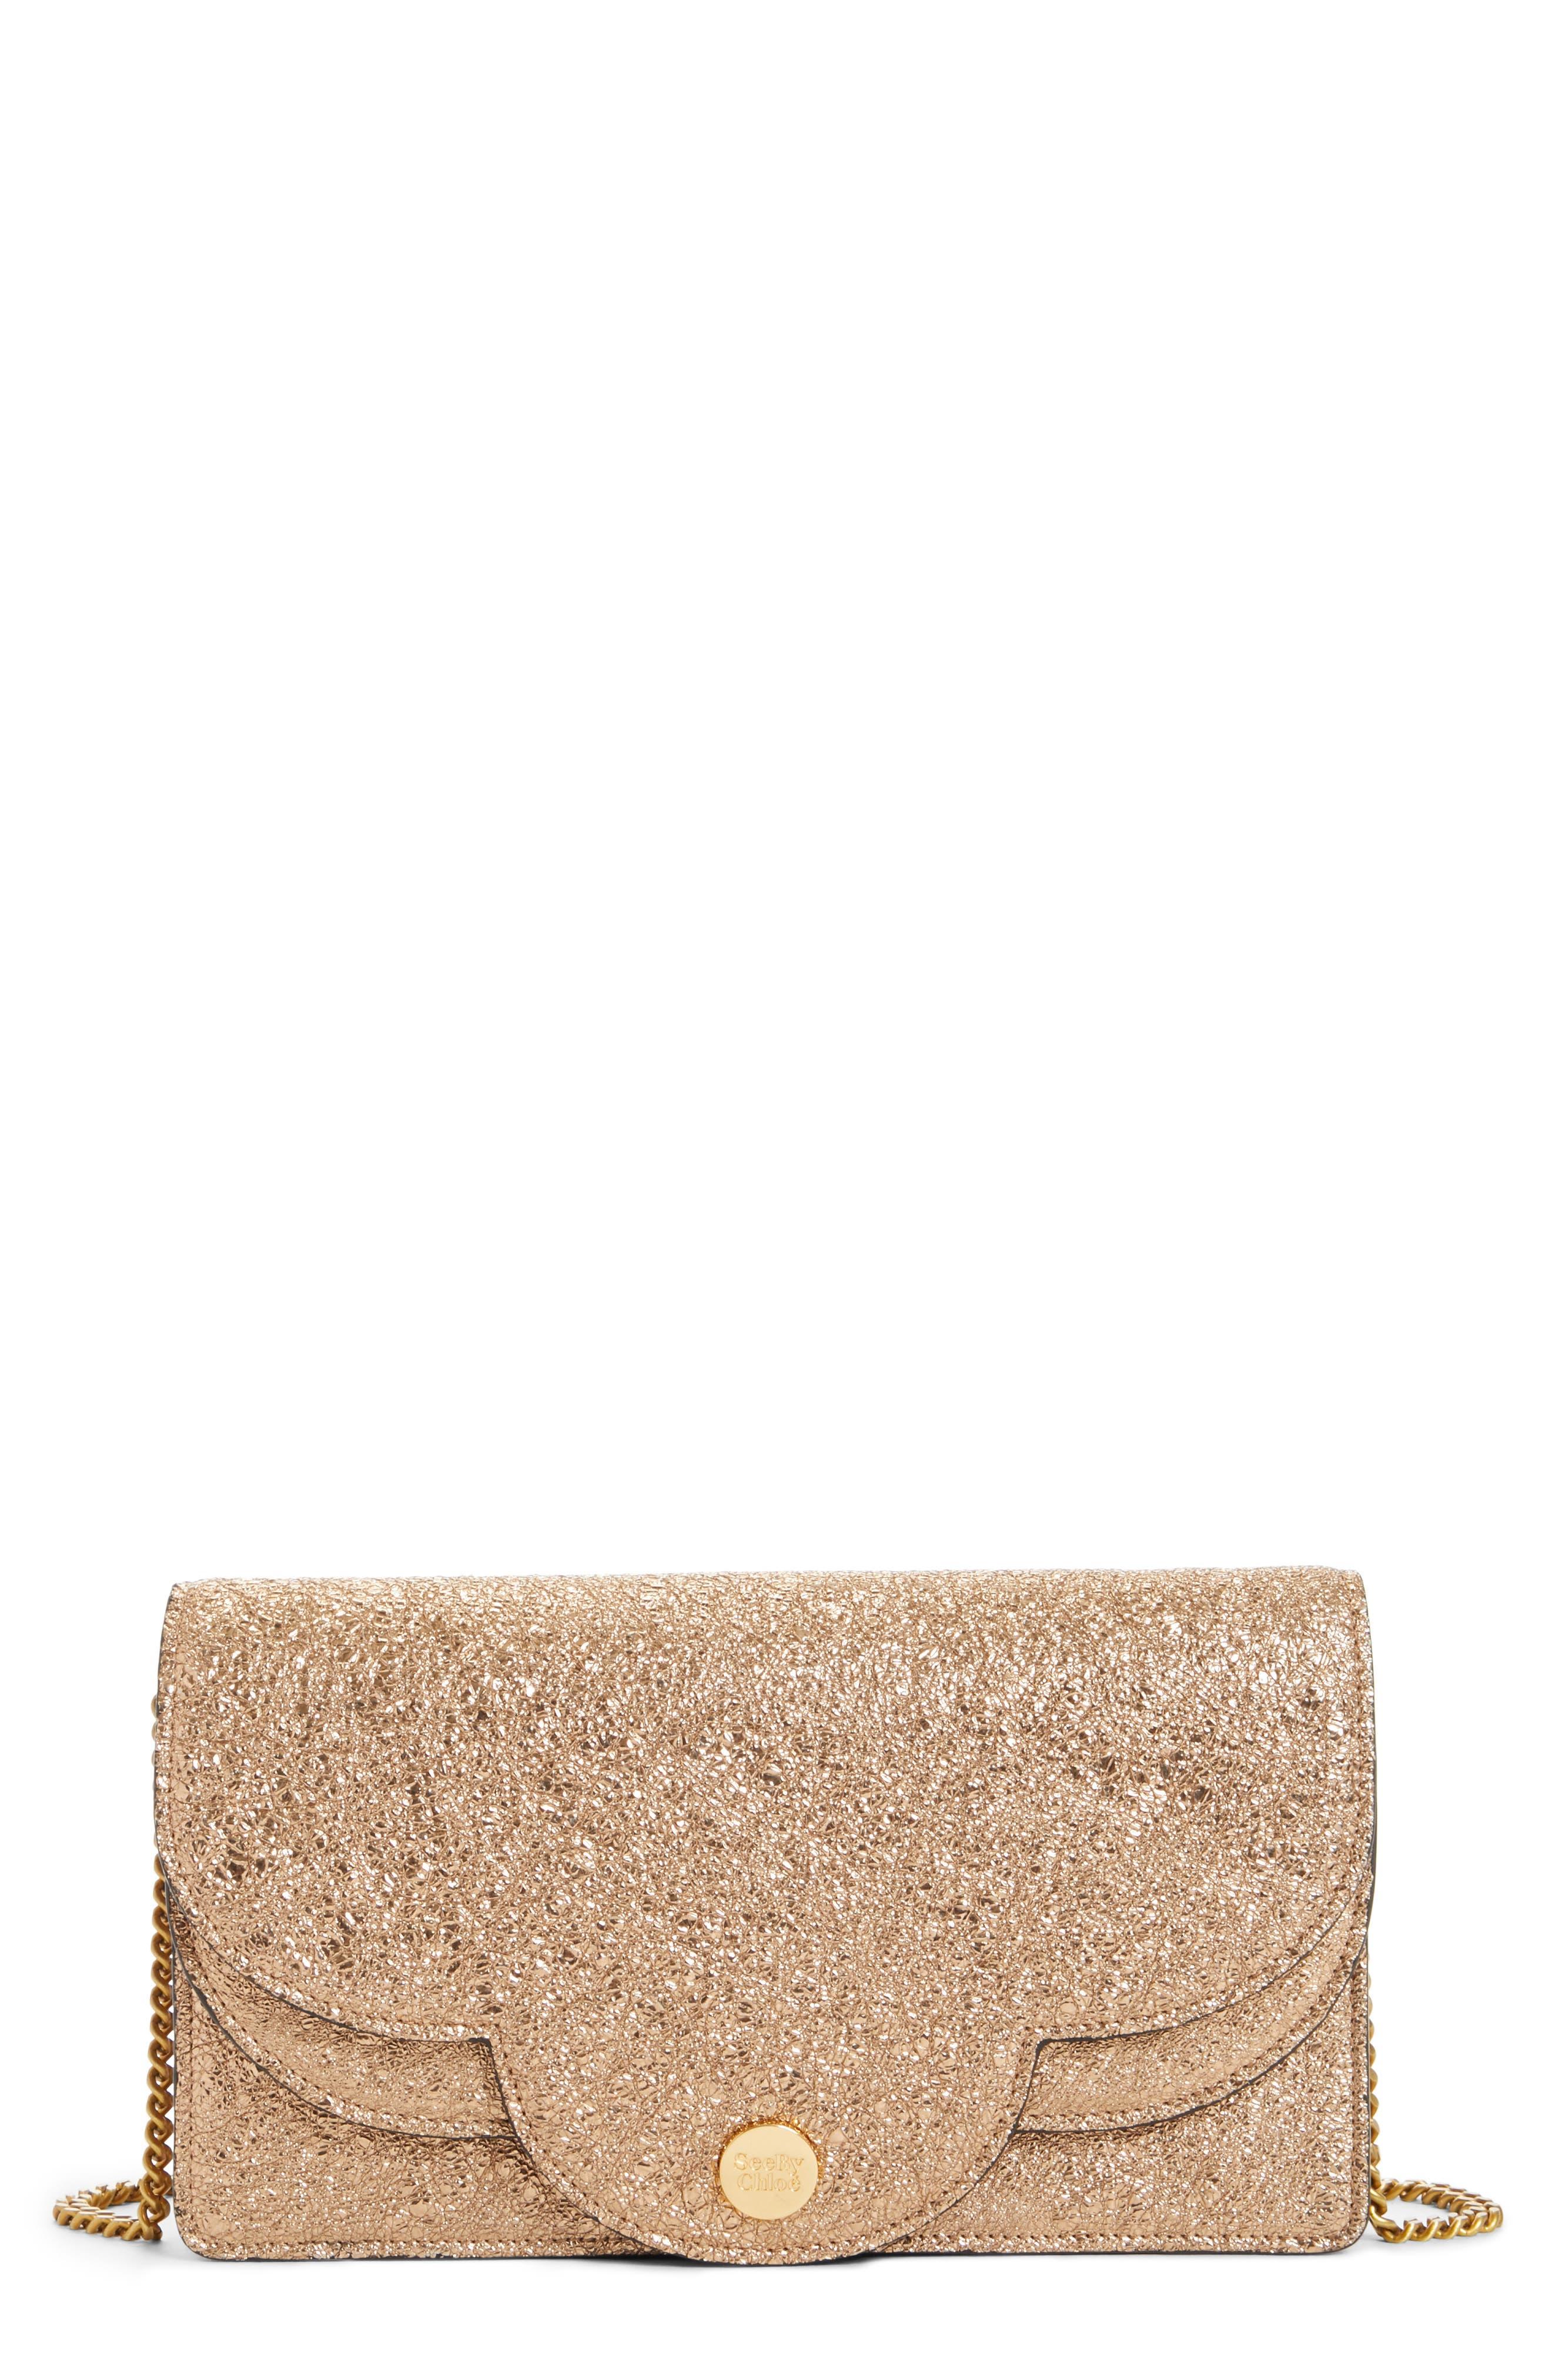 Polina Metallic Leather Crossbody Clutch,                         Main,                         color, 220